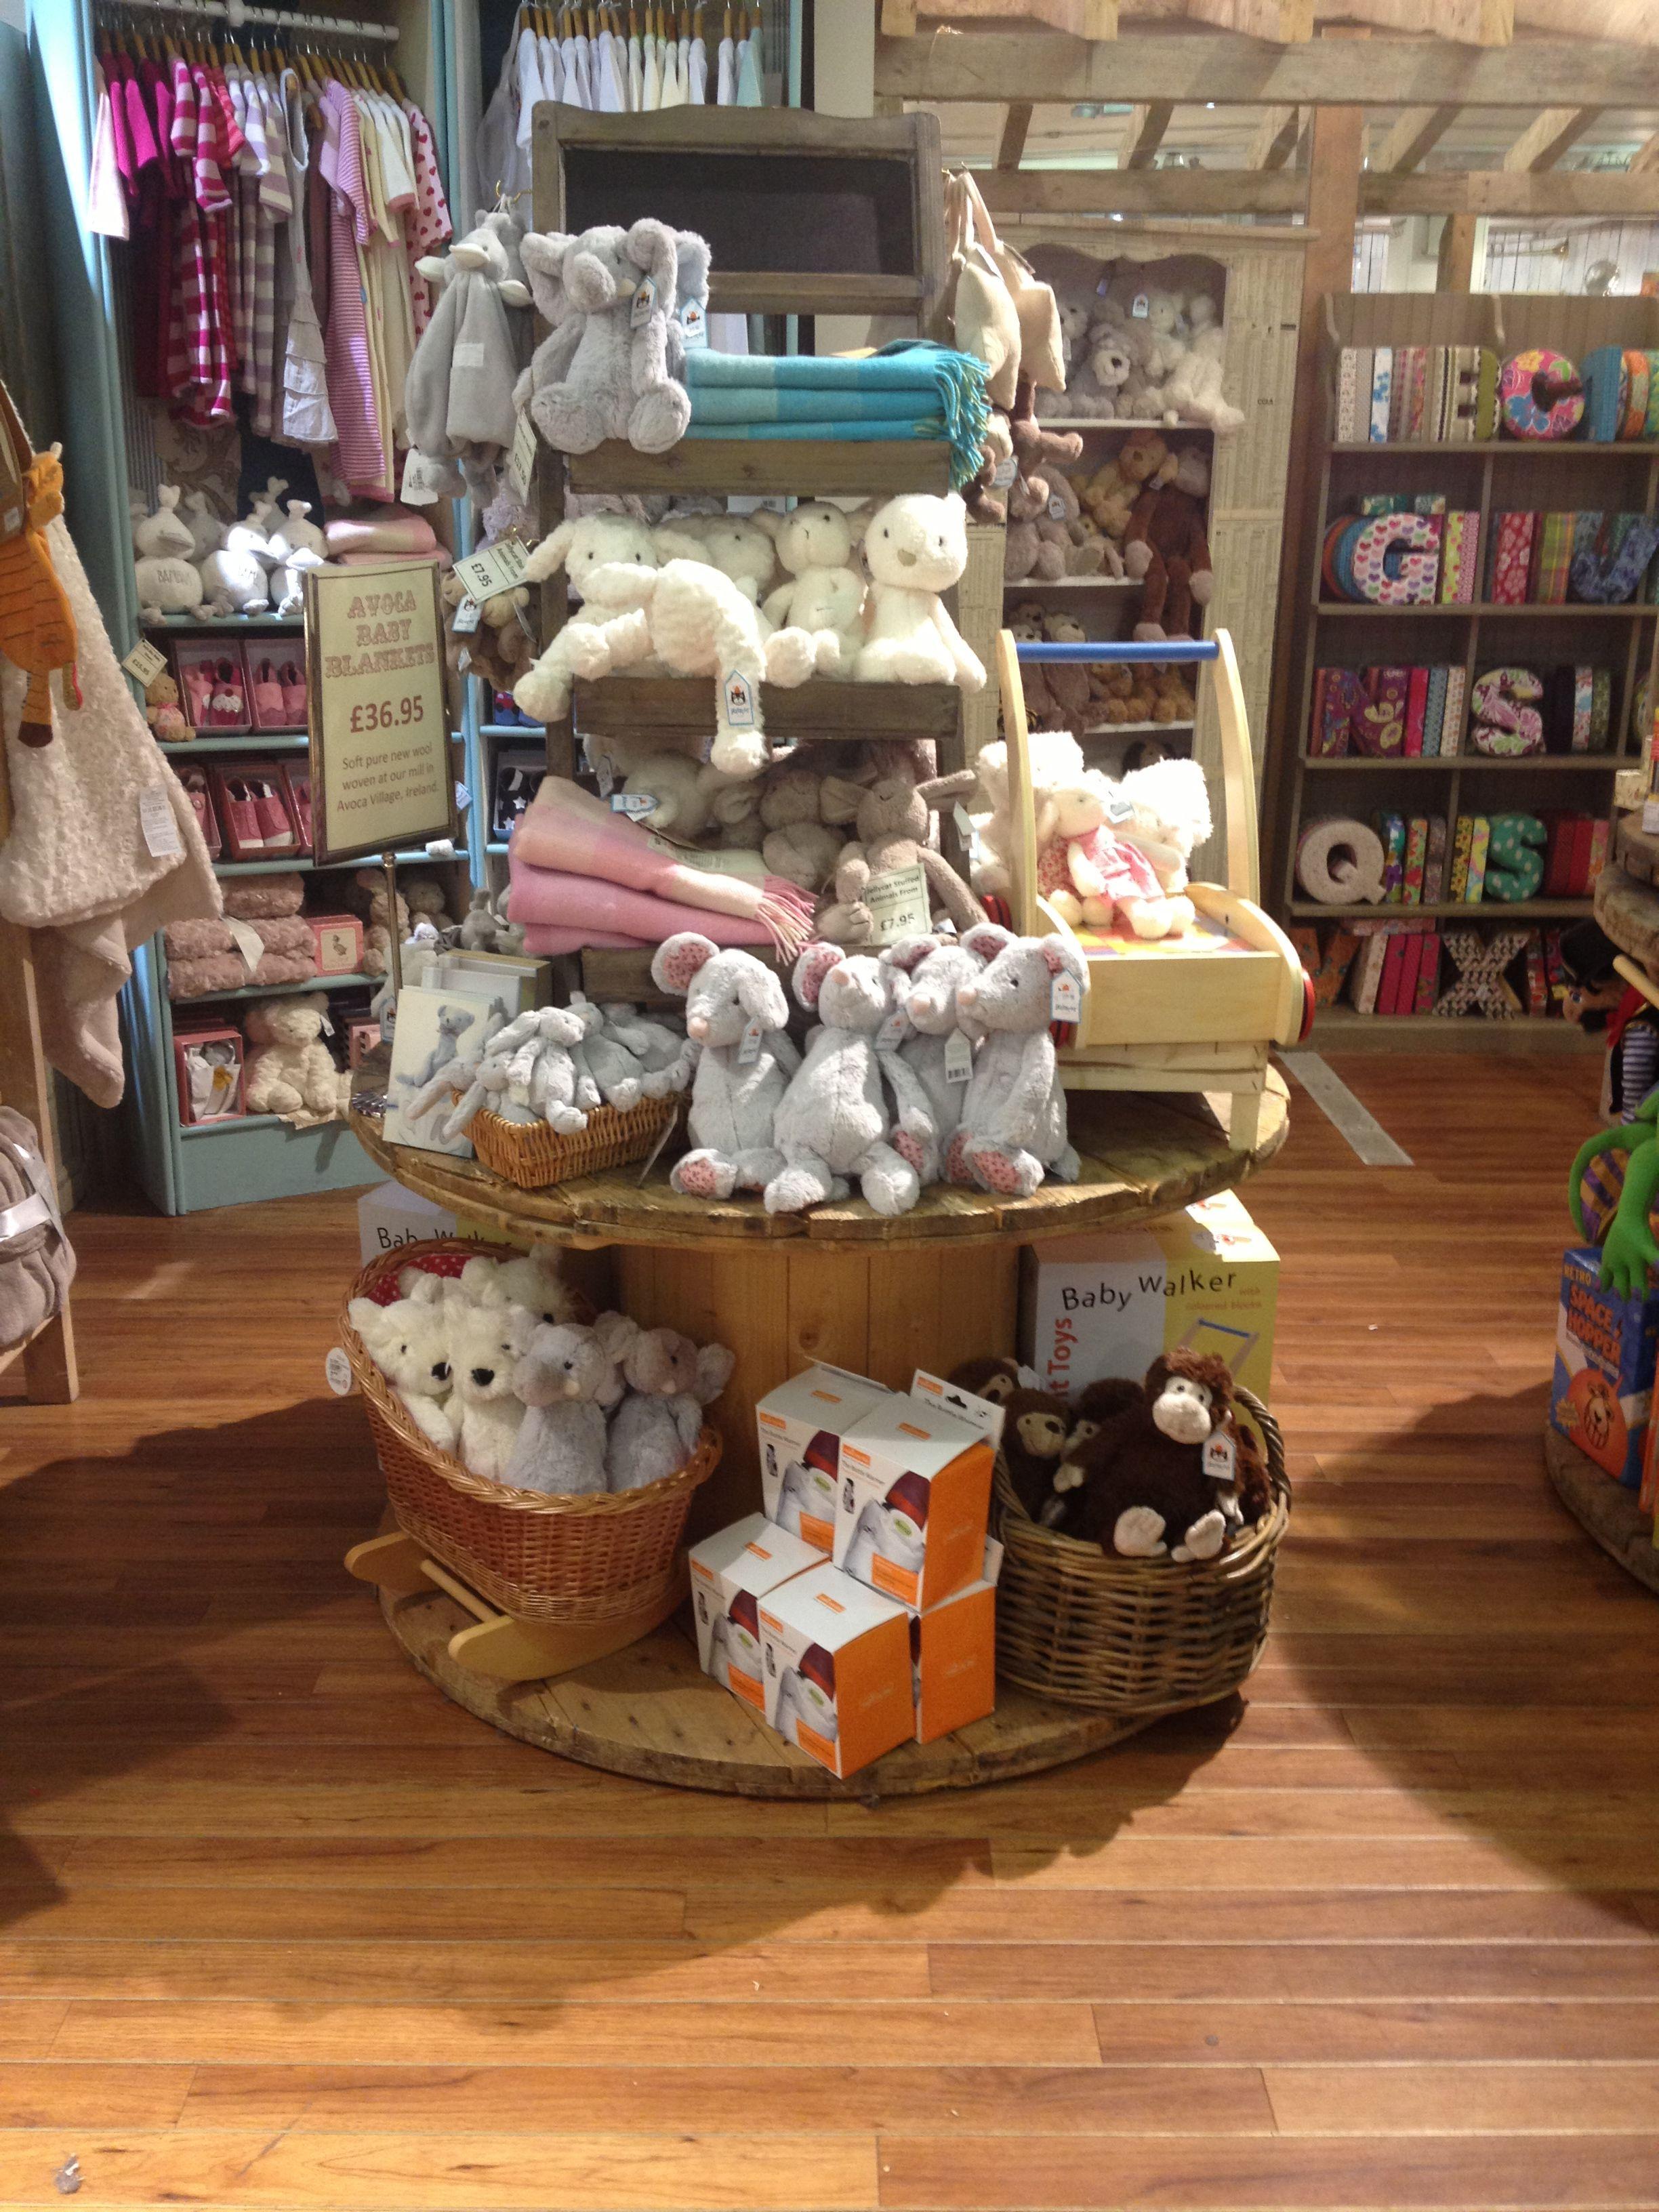 Display Idea Gift Shop Displays Christmas Shop Displays Boutique Display